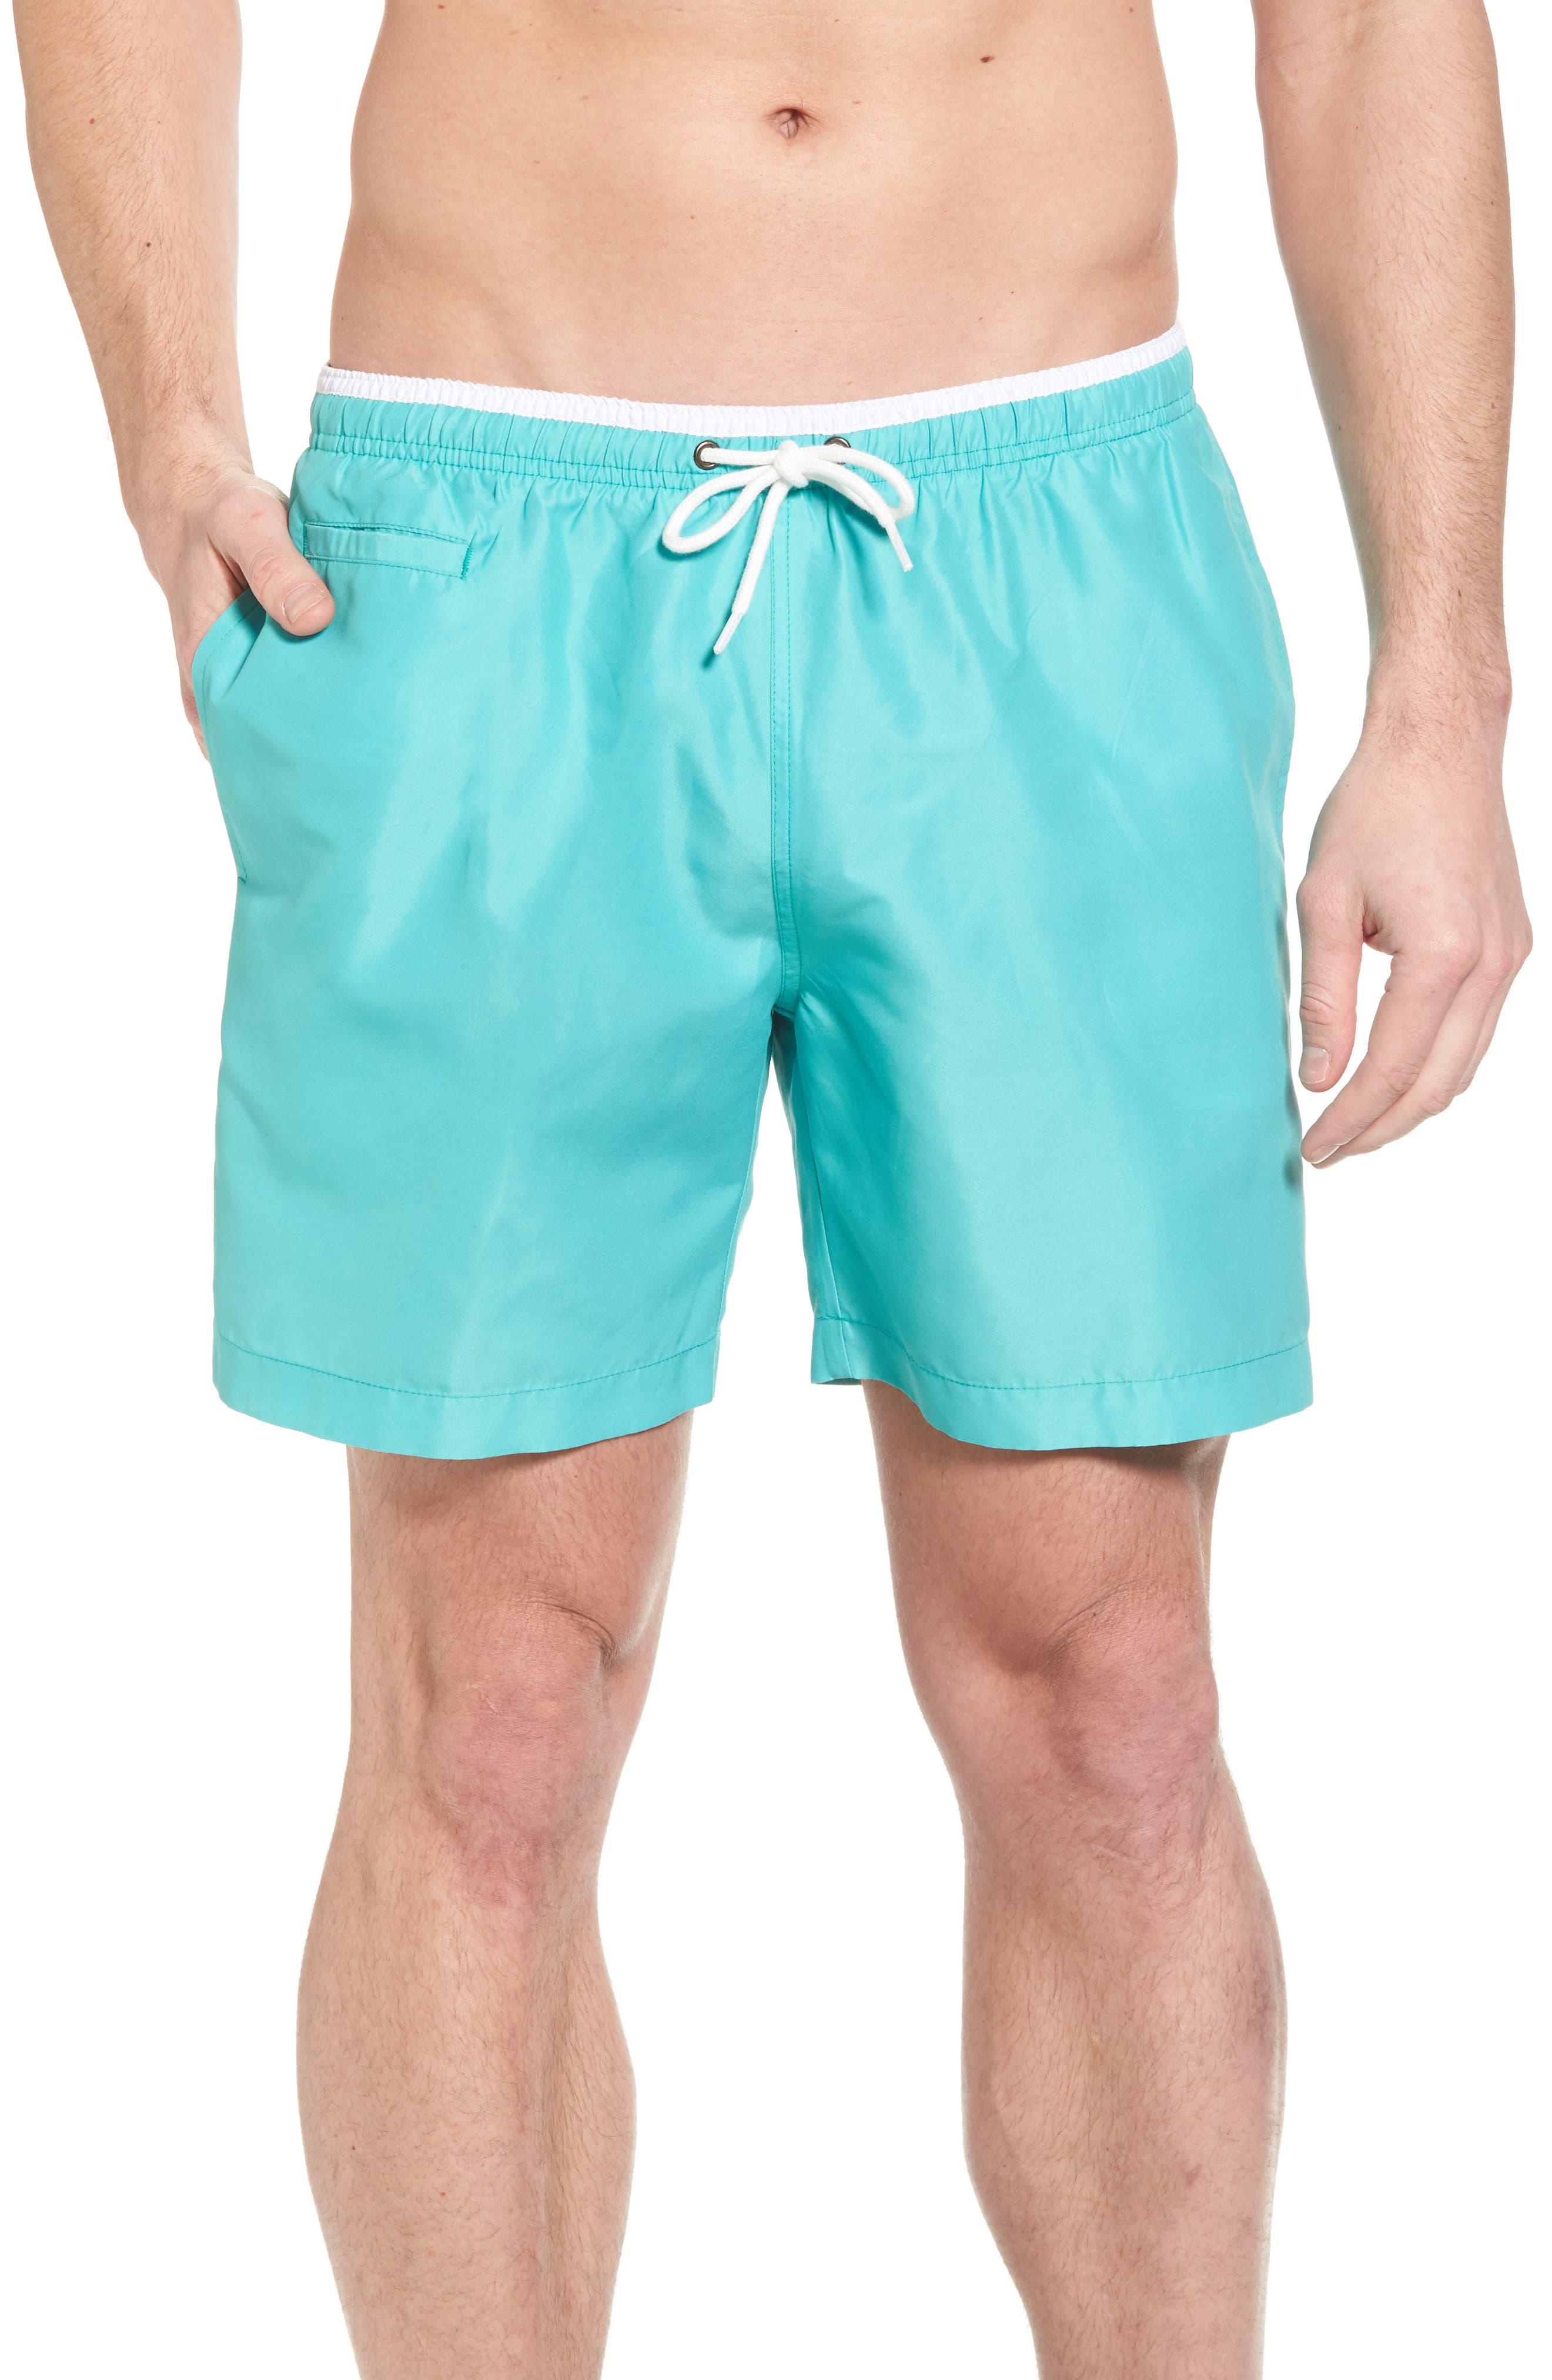 San O Swim Trunks,                         Main,                         color, Sea Green/ White